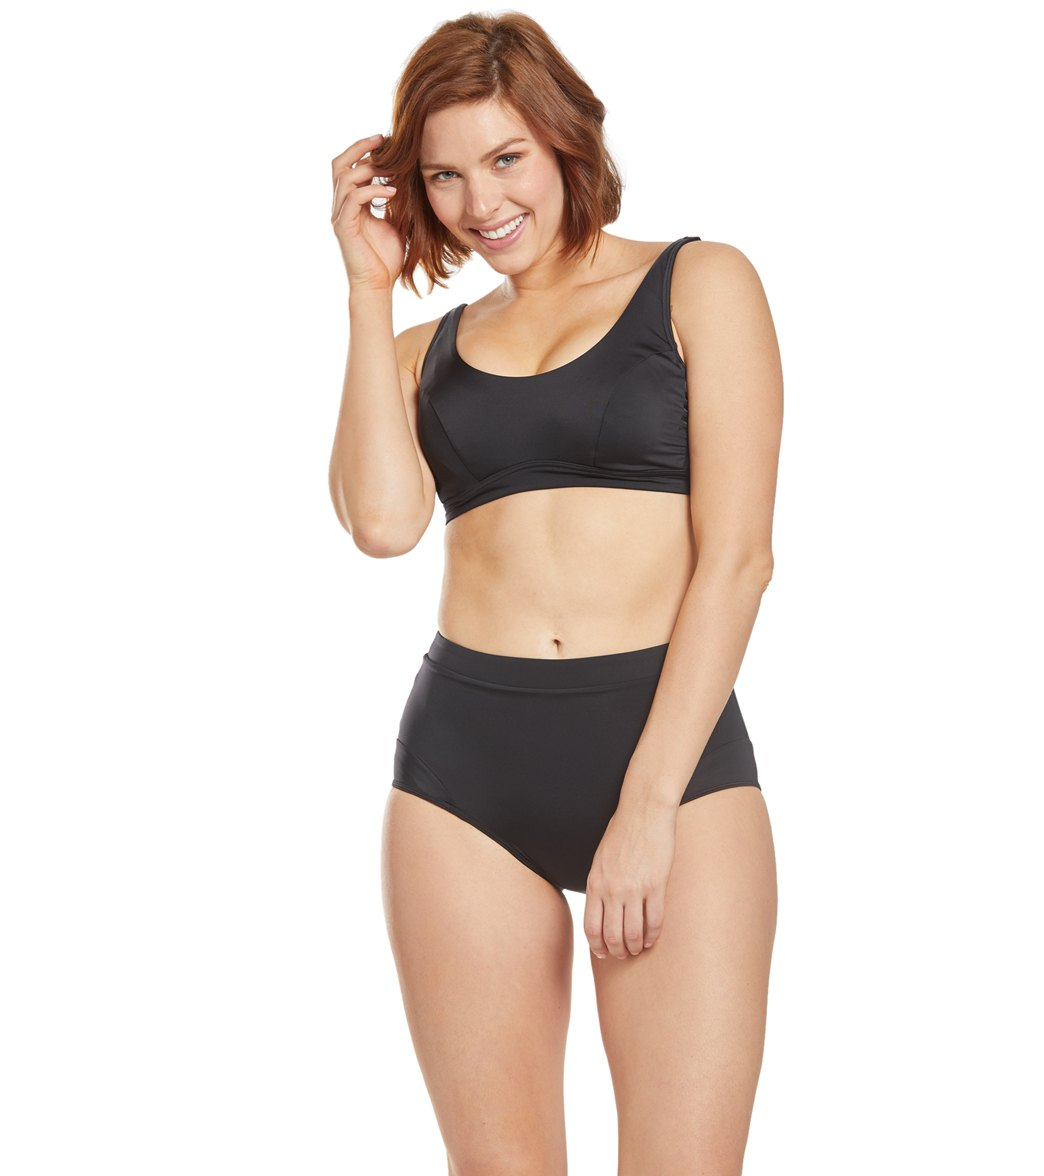 d7f3f305833f9 Prana Solid Abella Bikini Top (D-Cup) at SwimOutlet.com - Free Shipping